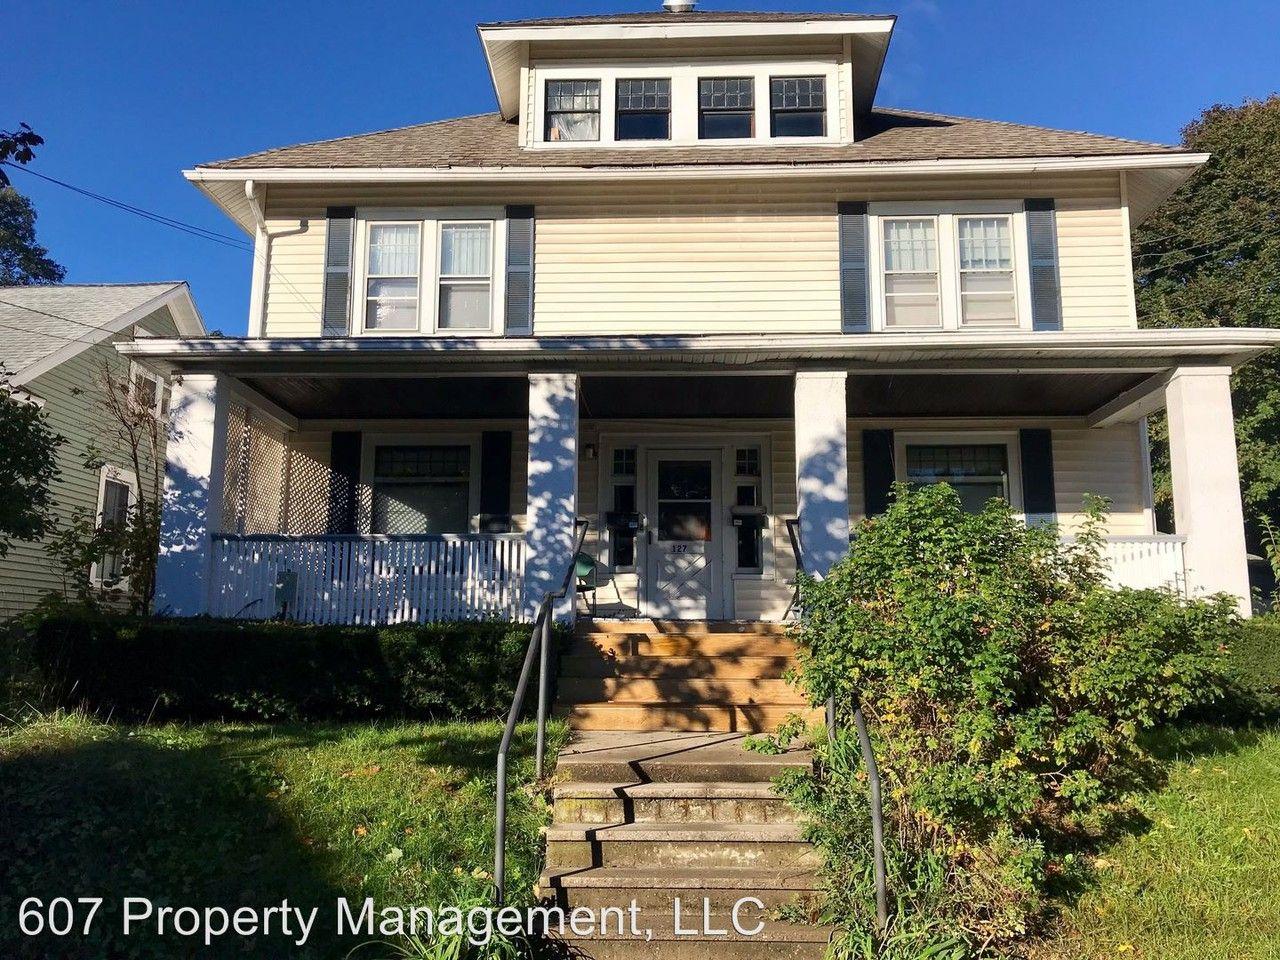 127 Laurel Ave Binghamton Ny 13905 4 Bedroom Apartment